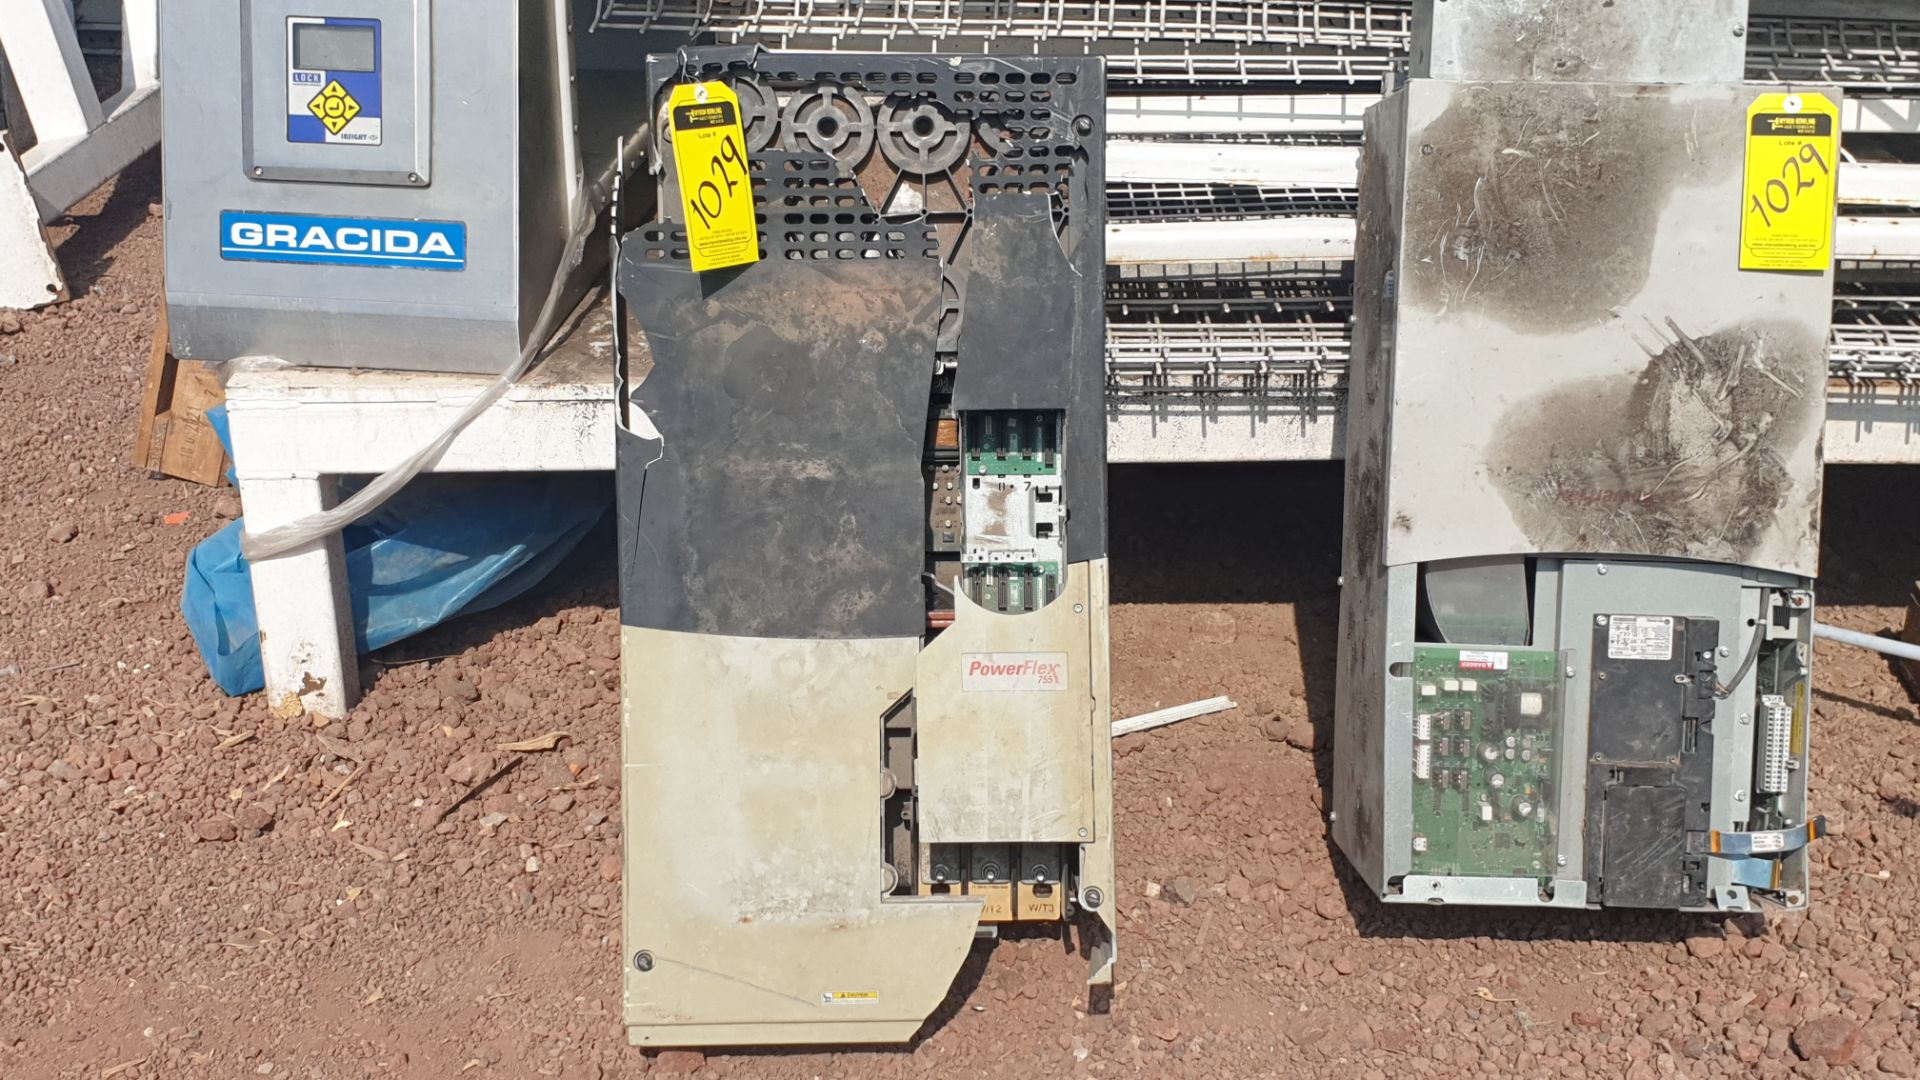 2 Powerflex Variator boards, model 20G1AN, 20BD180A0AYNANC0 - Image 12 of 13